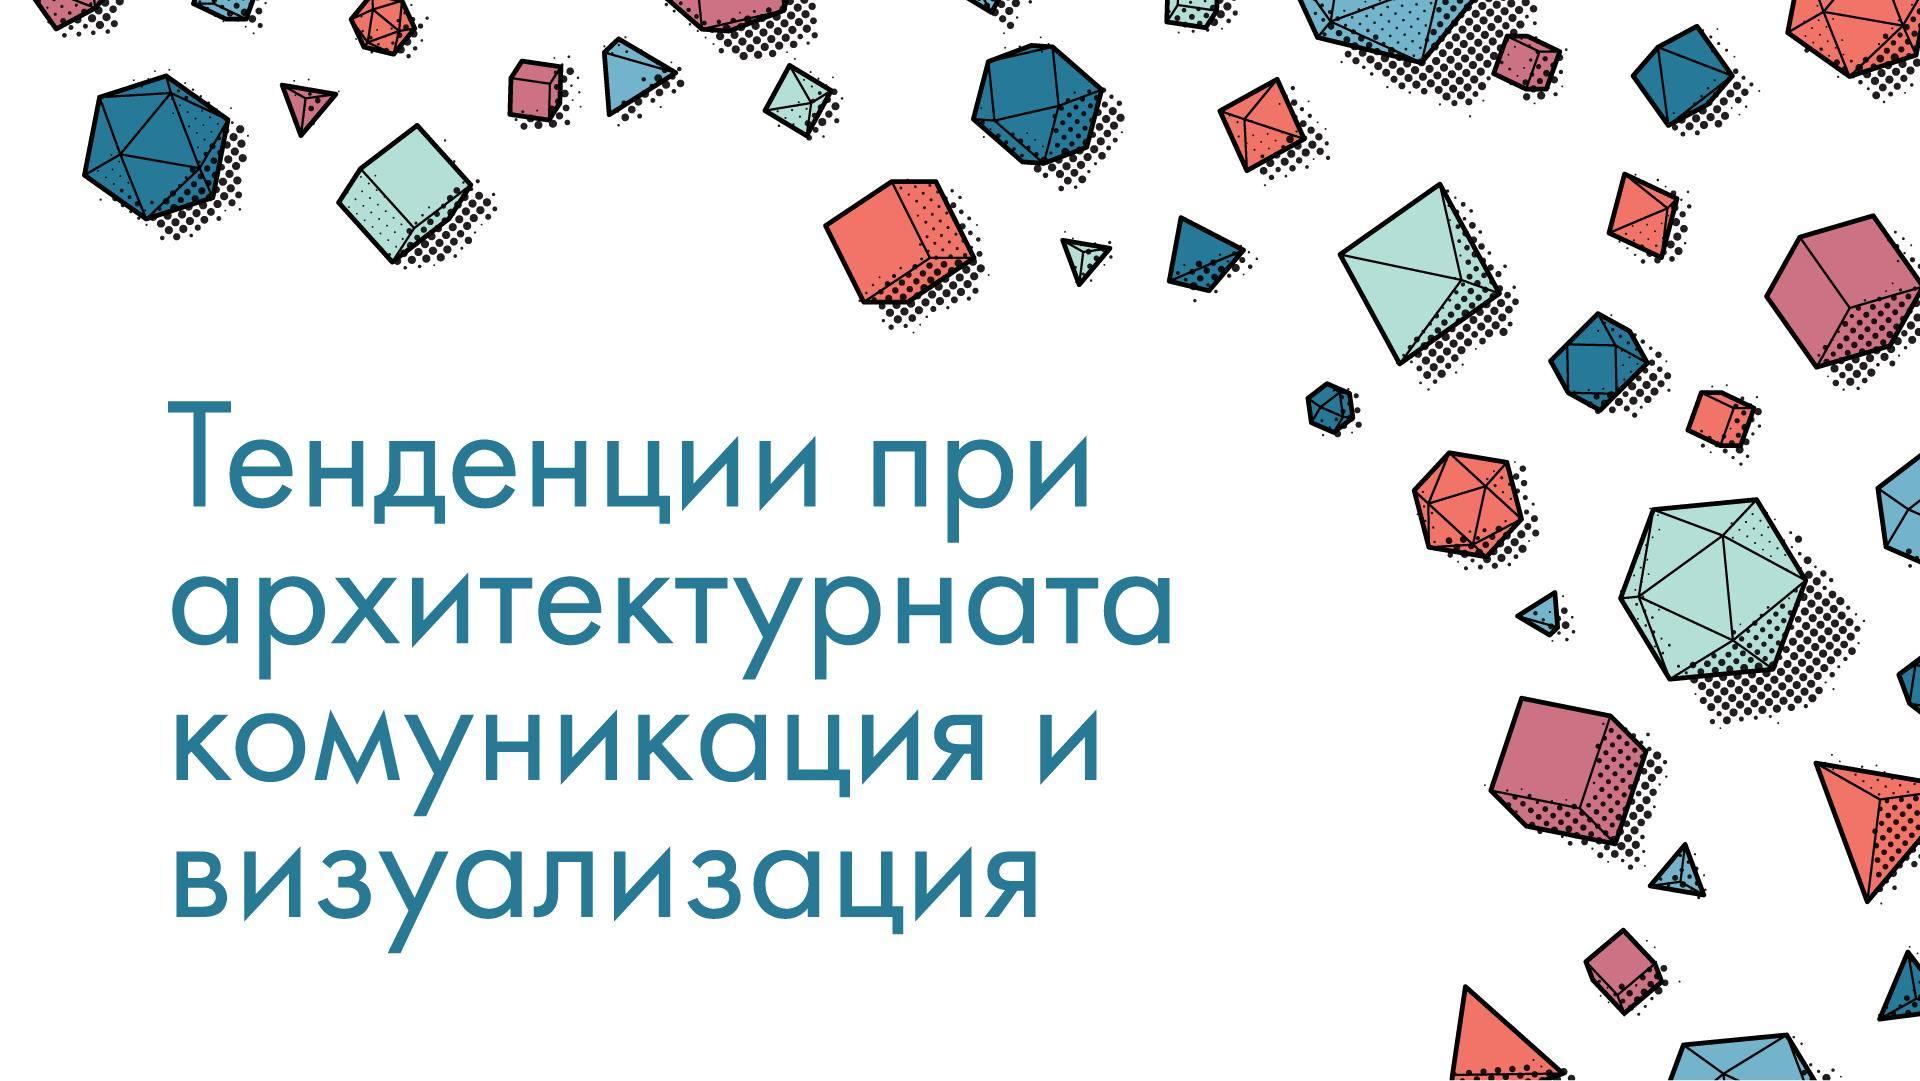 22384308_1101026923366079_7954844178651853673_o